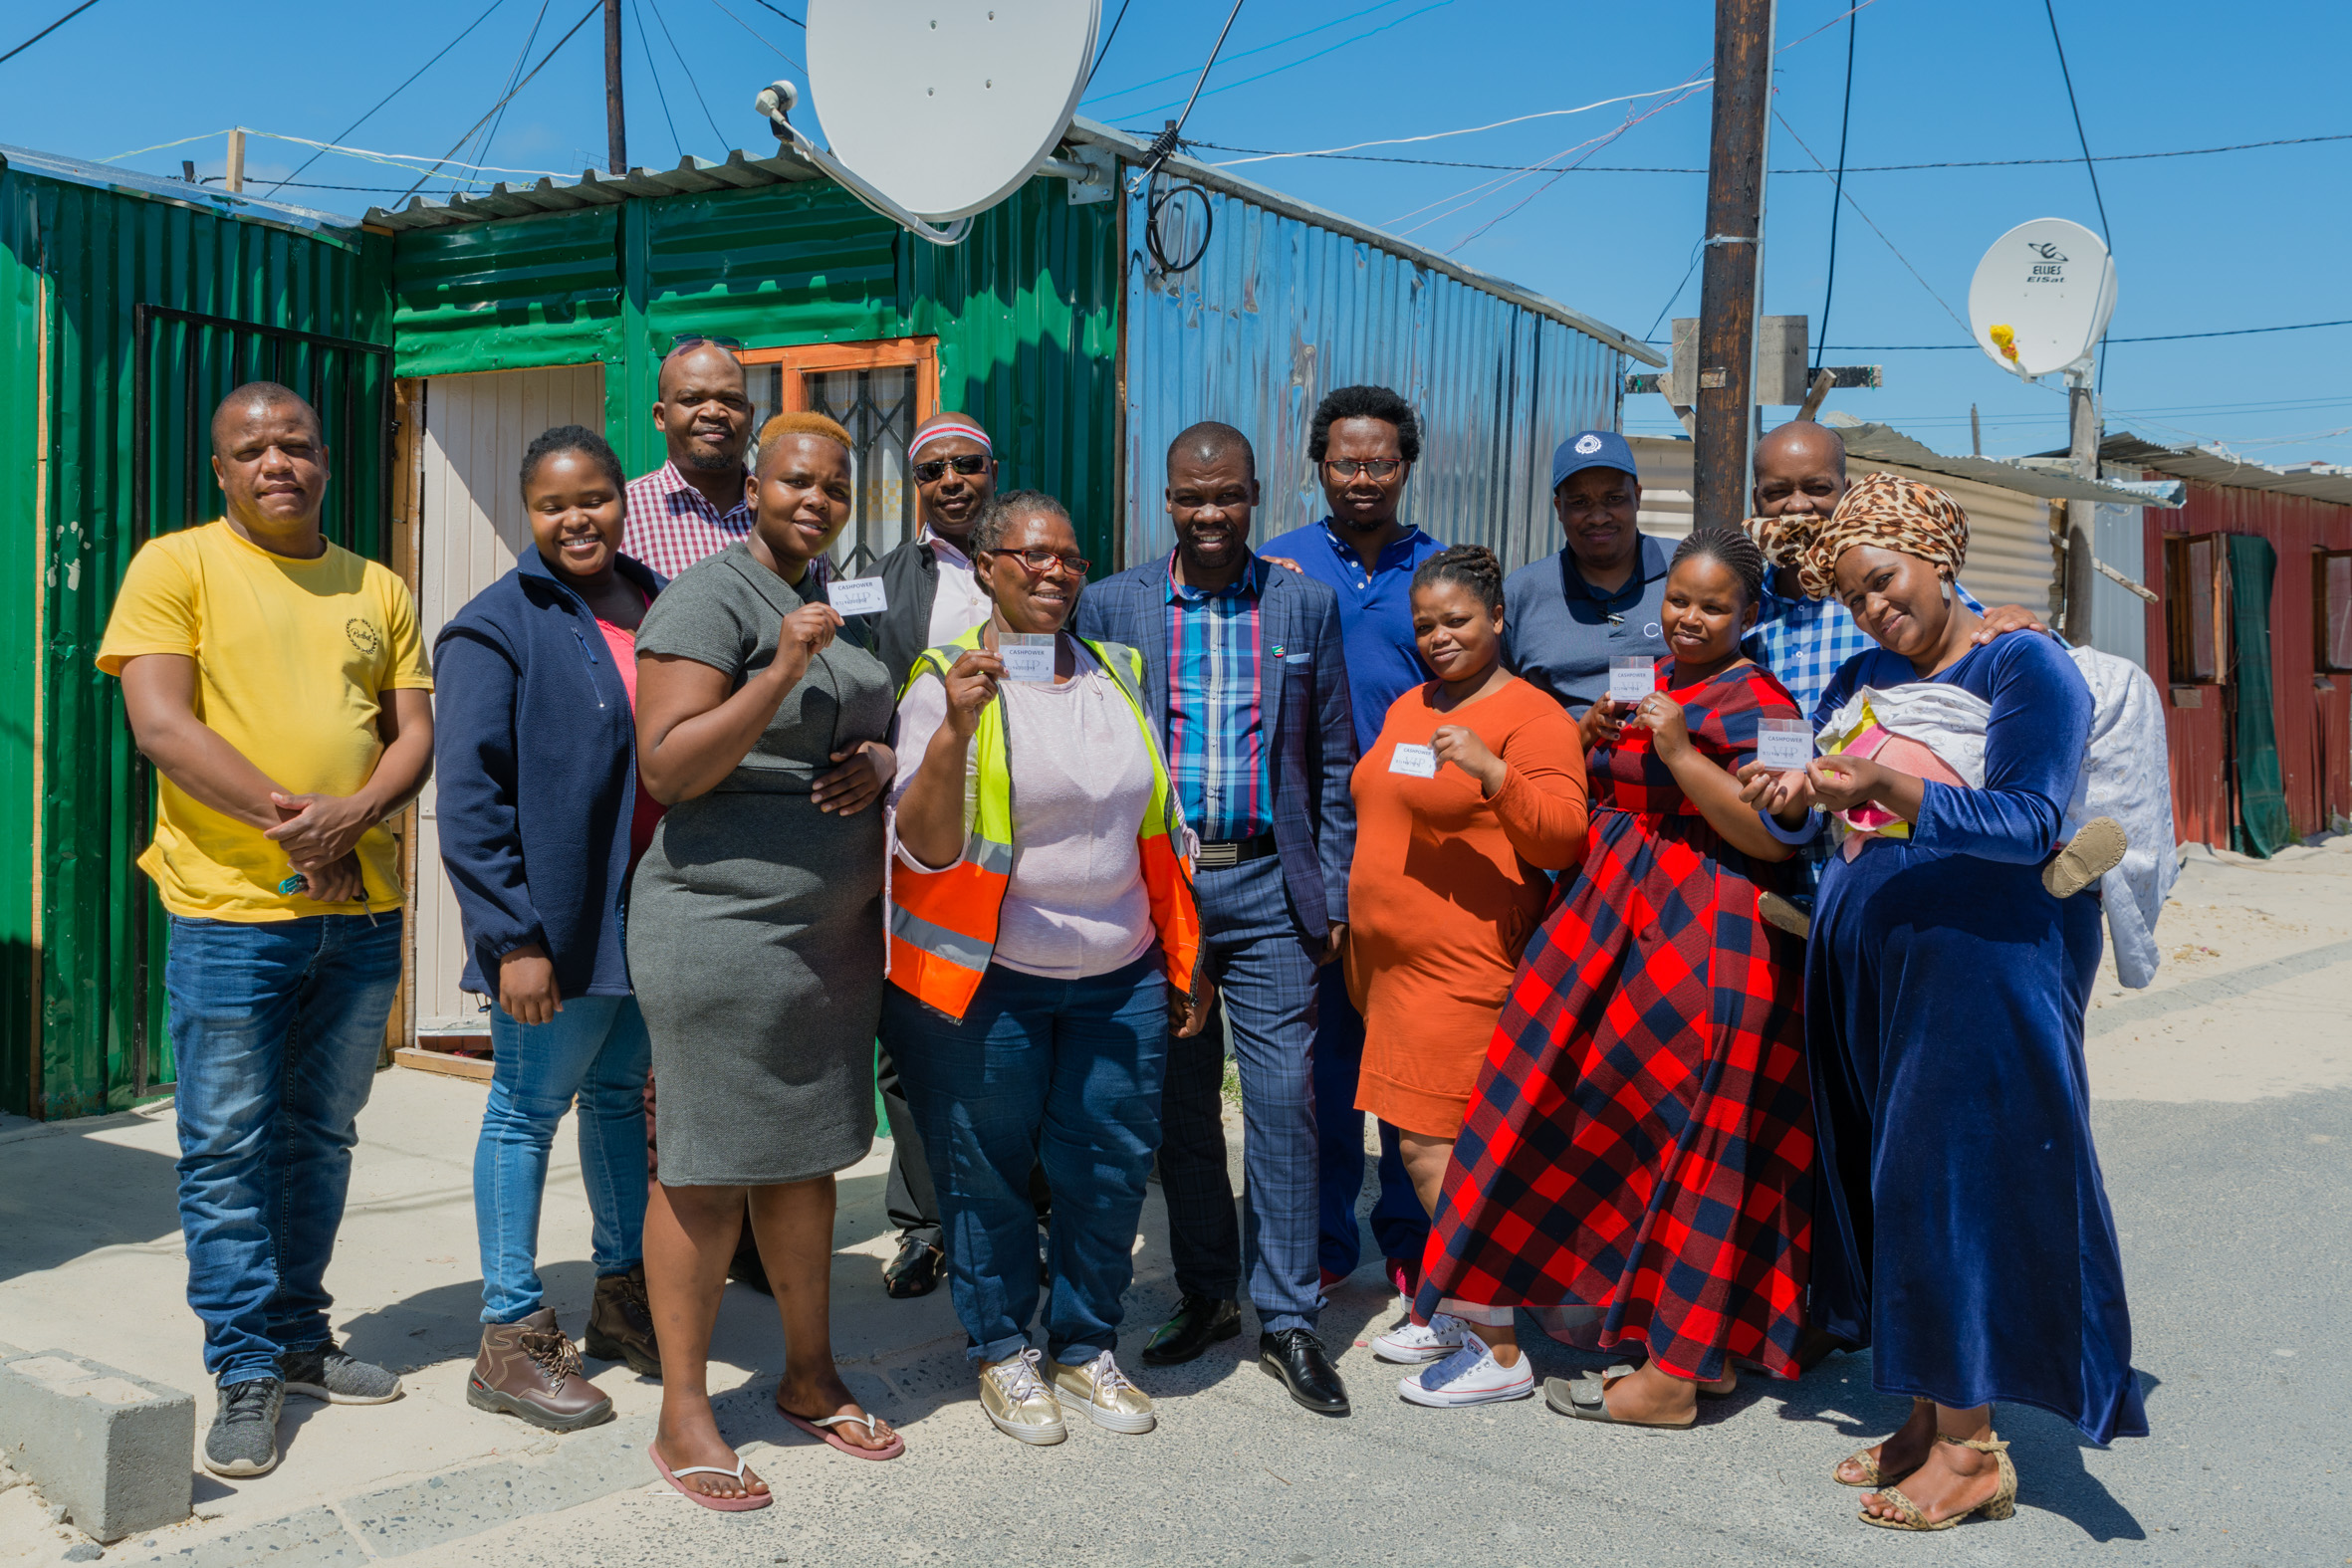 City lights up Esantini informal settlement in Mfuleni